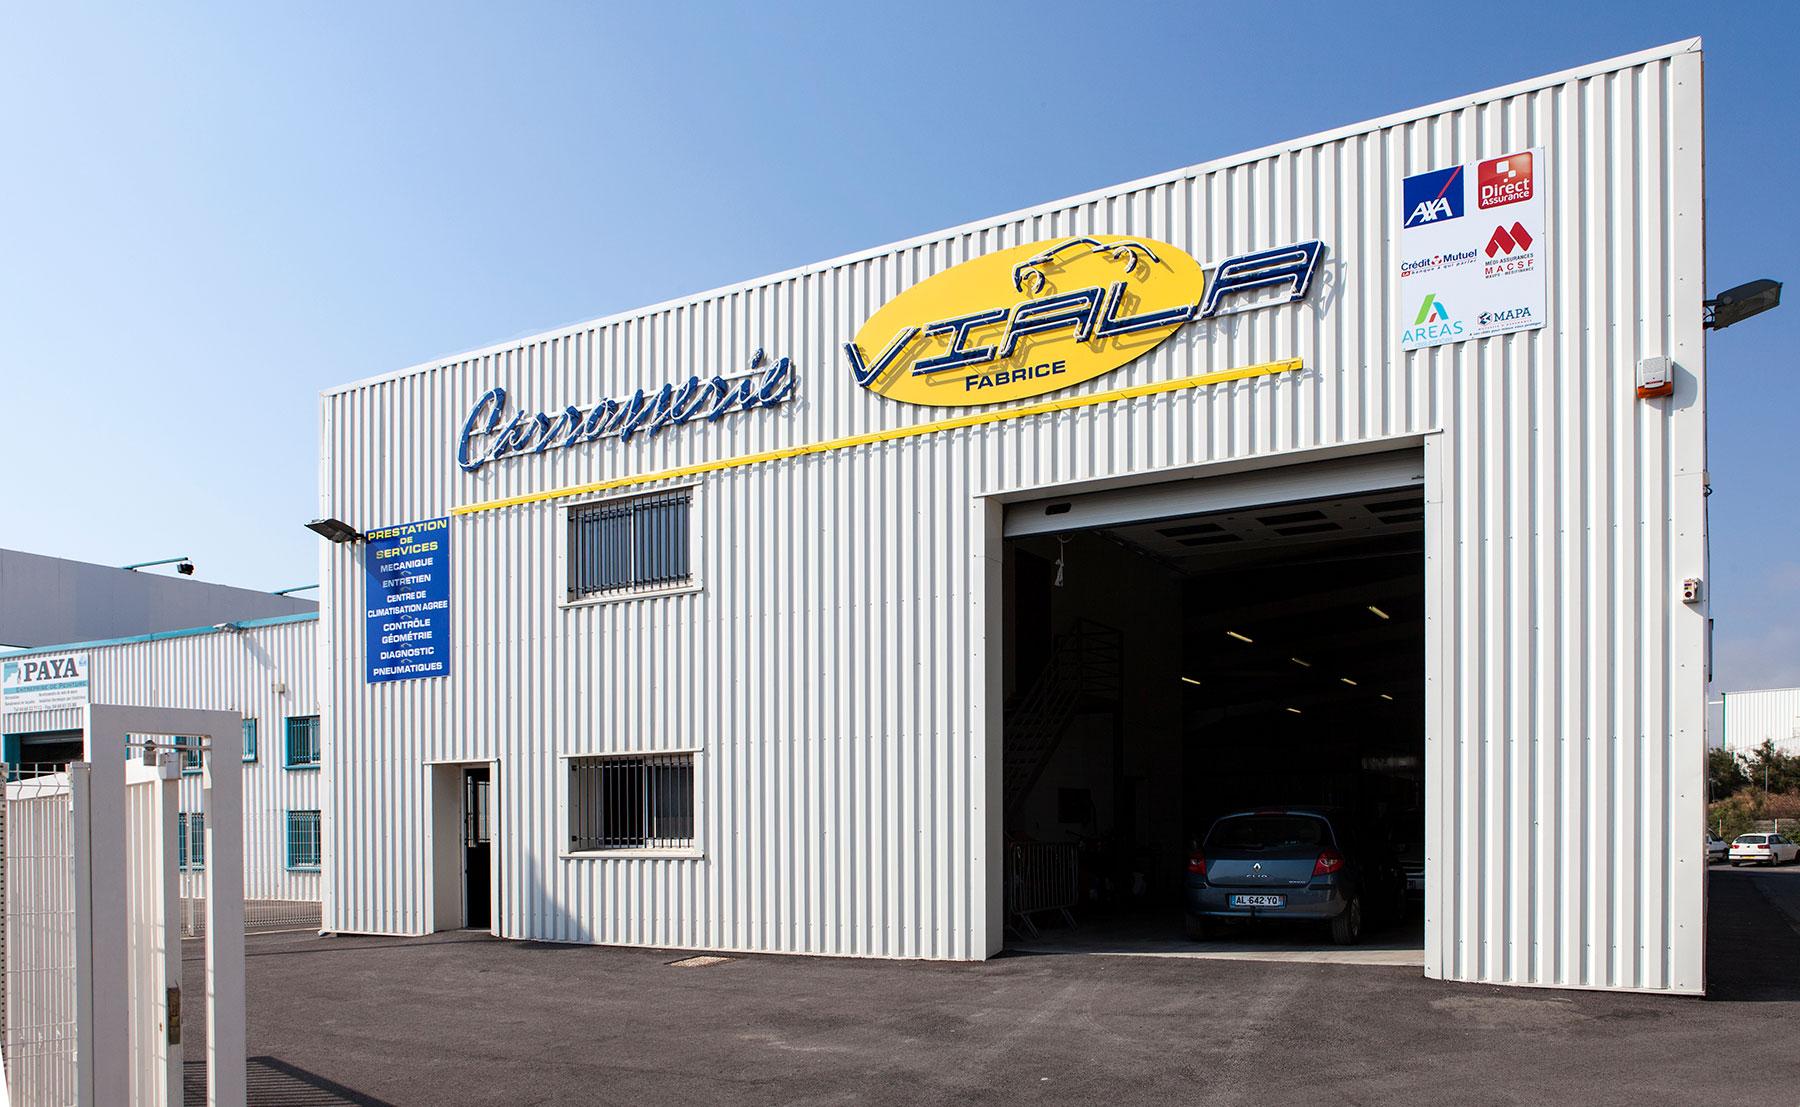 CARROSSERIE VIALA - Bâtiment industriel, entrepôt